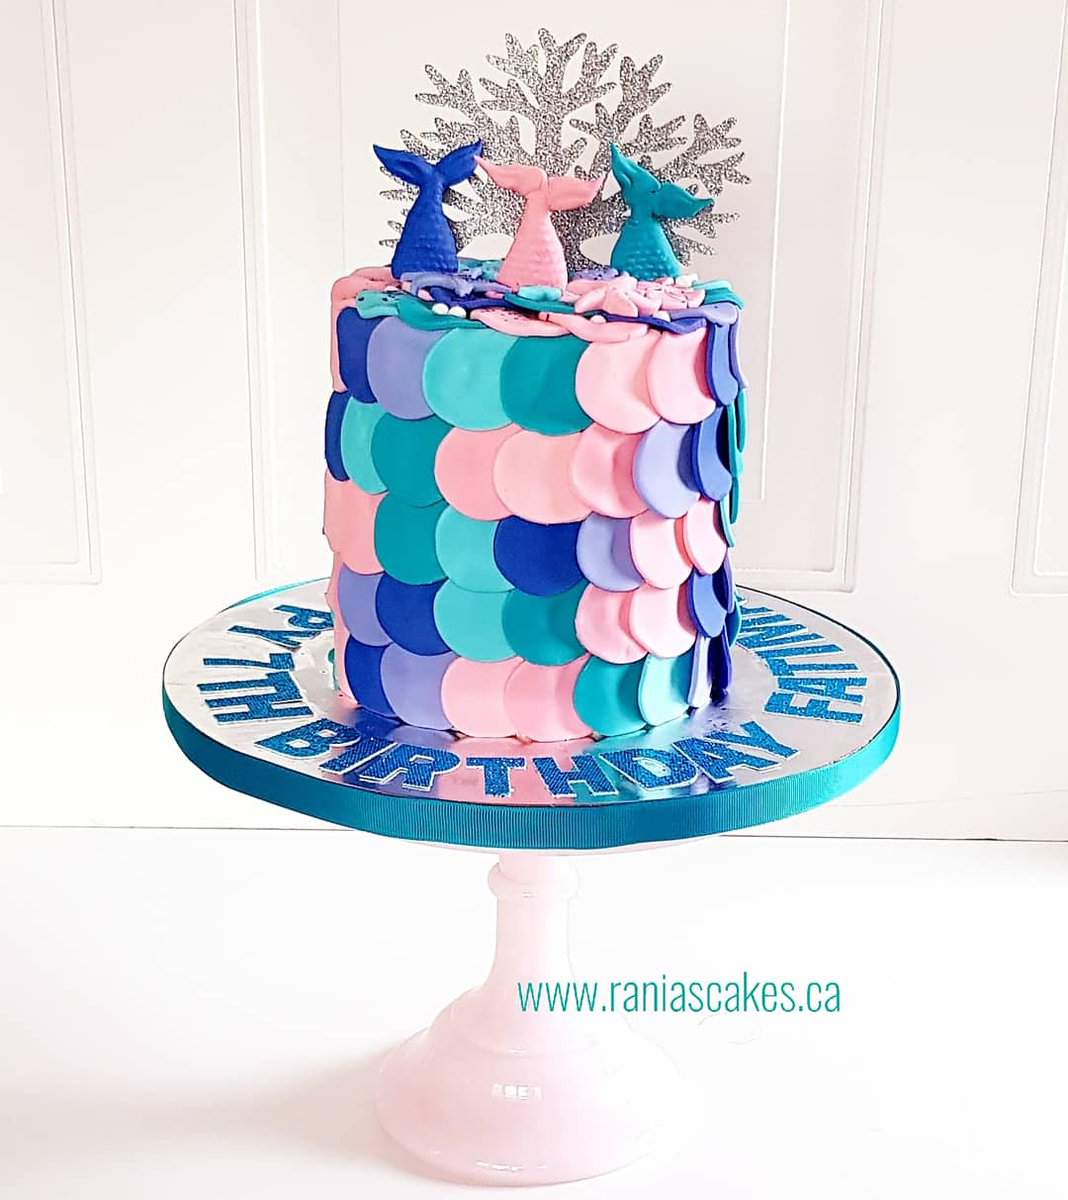 A #Mermaid #theme has always been a #birthdaygirl favorite 🧜♀️  #birthday #cake #fondant #buttercream #customcakes #eventplanner #occasion #cakemaker #gtacakes #mississaugacakes #torontocakes #foodie #bakery #sweet #occasions #underthesea #girlcakes #rainbowcakes #pink #blue